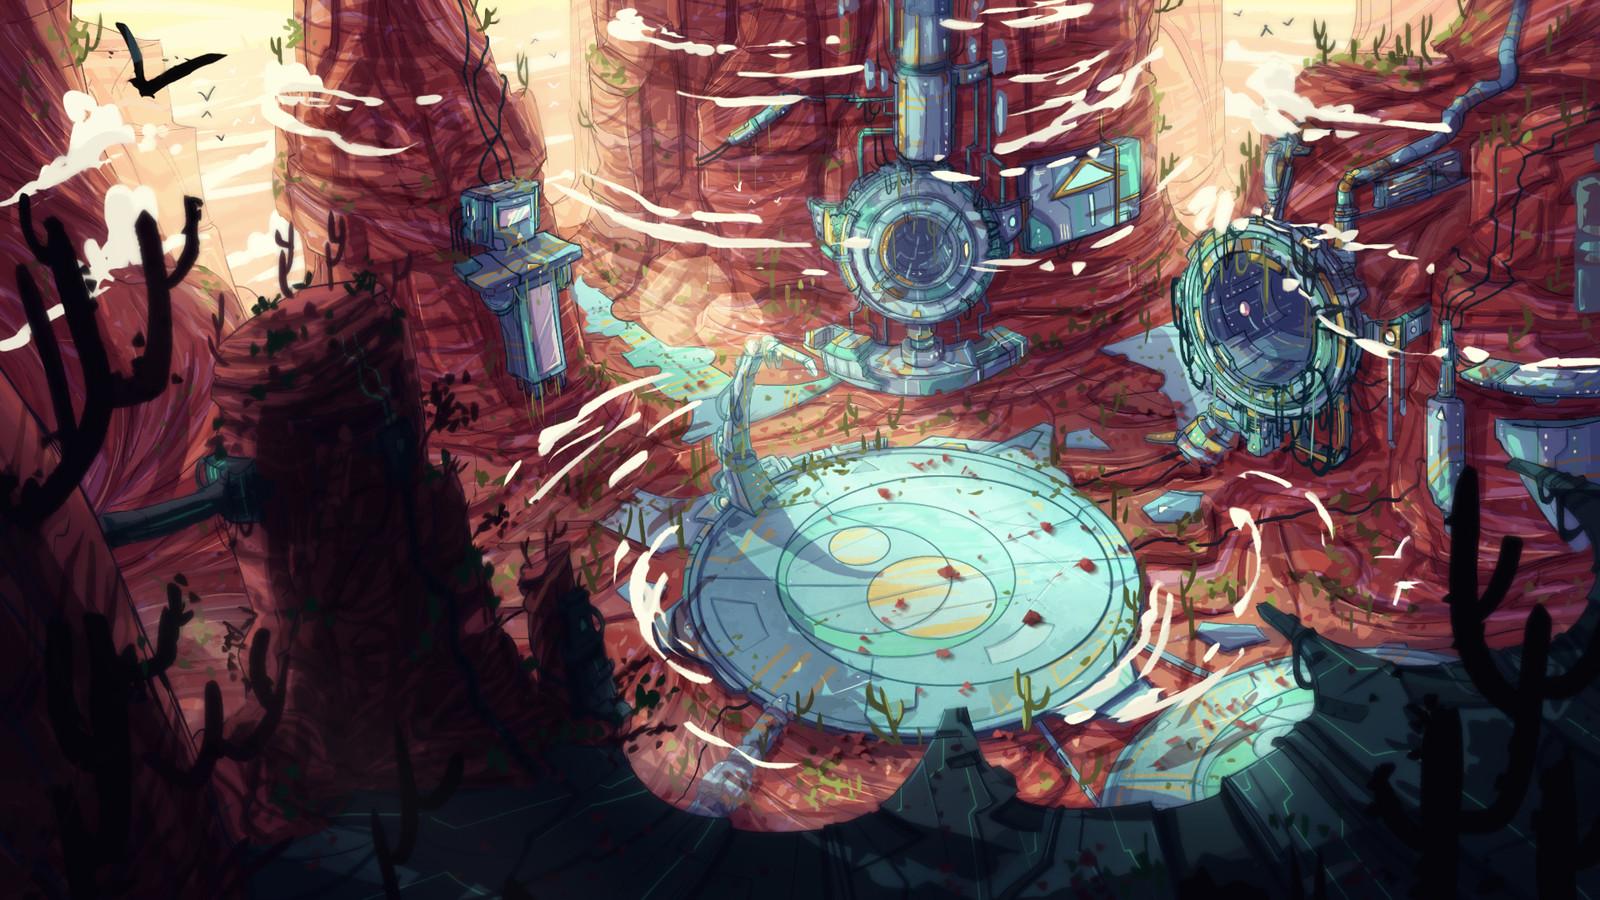 Desertic & Abandoned (Transformers 2D series)